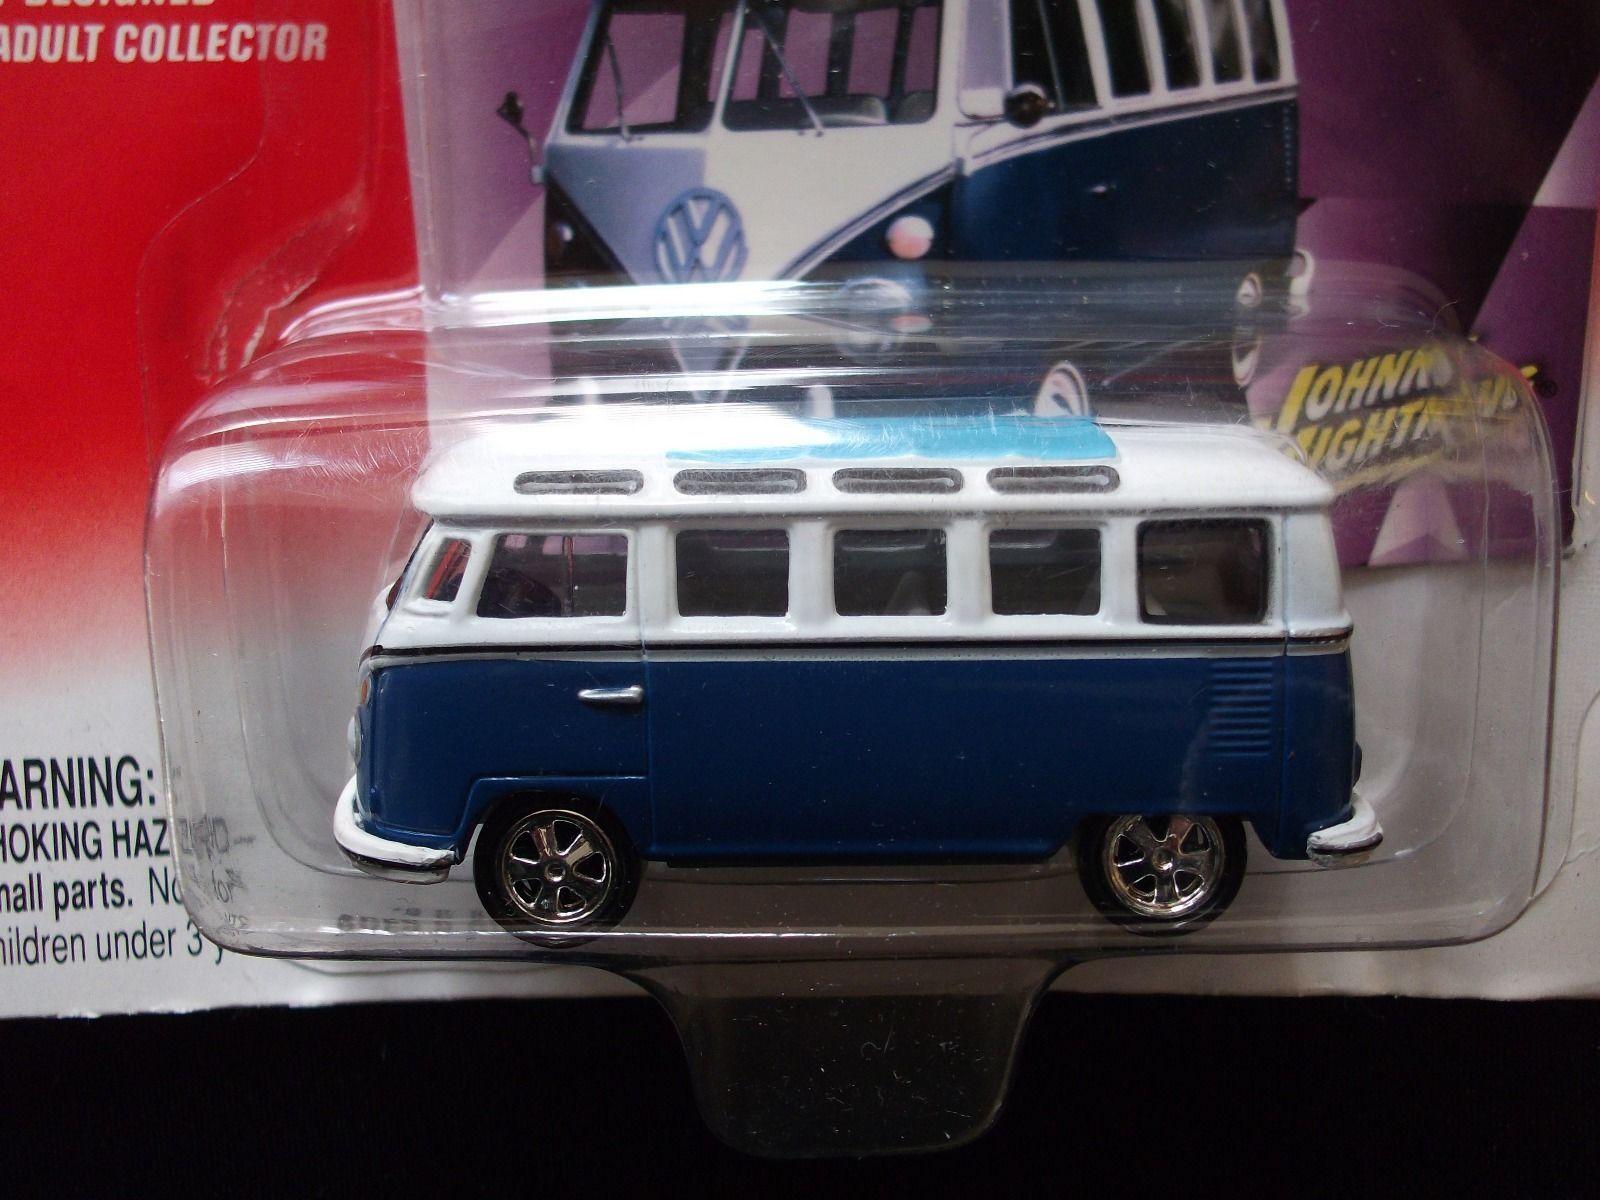 1966 21 WINDOW VW SAMBA BUS JOHNNY LIGHTNING VOLKSWAGEN SERIES CARS